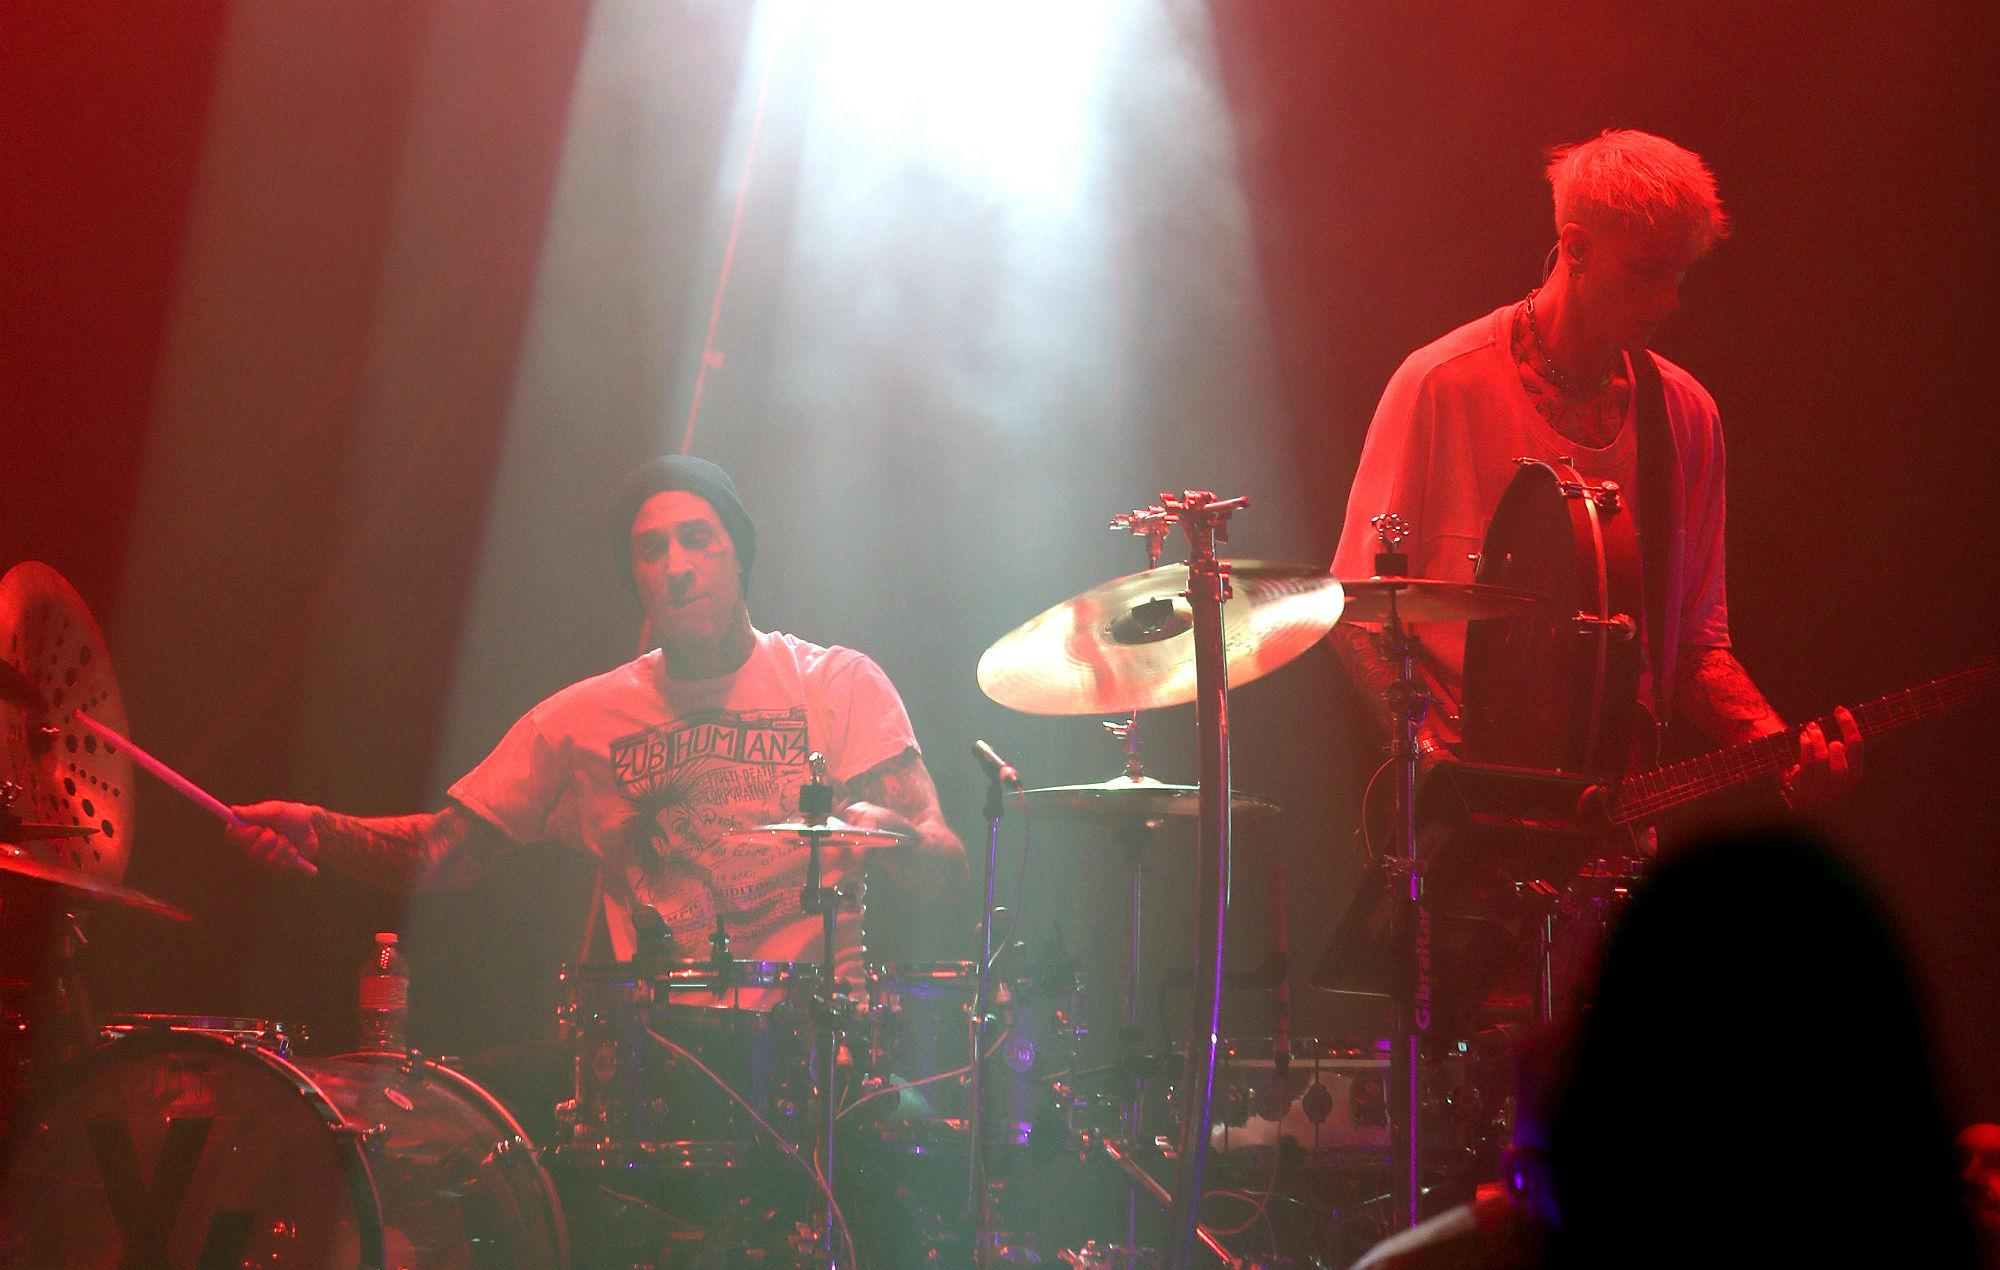 Travis Barker and Machine Gun Kelly perform live in 2019